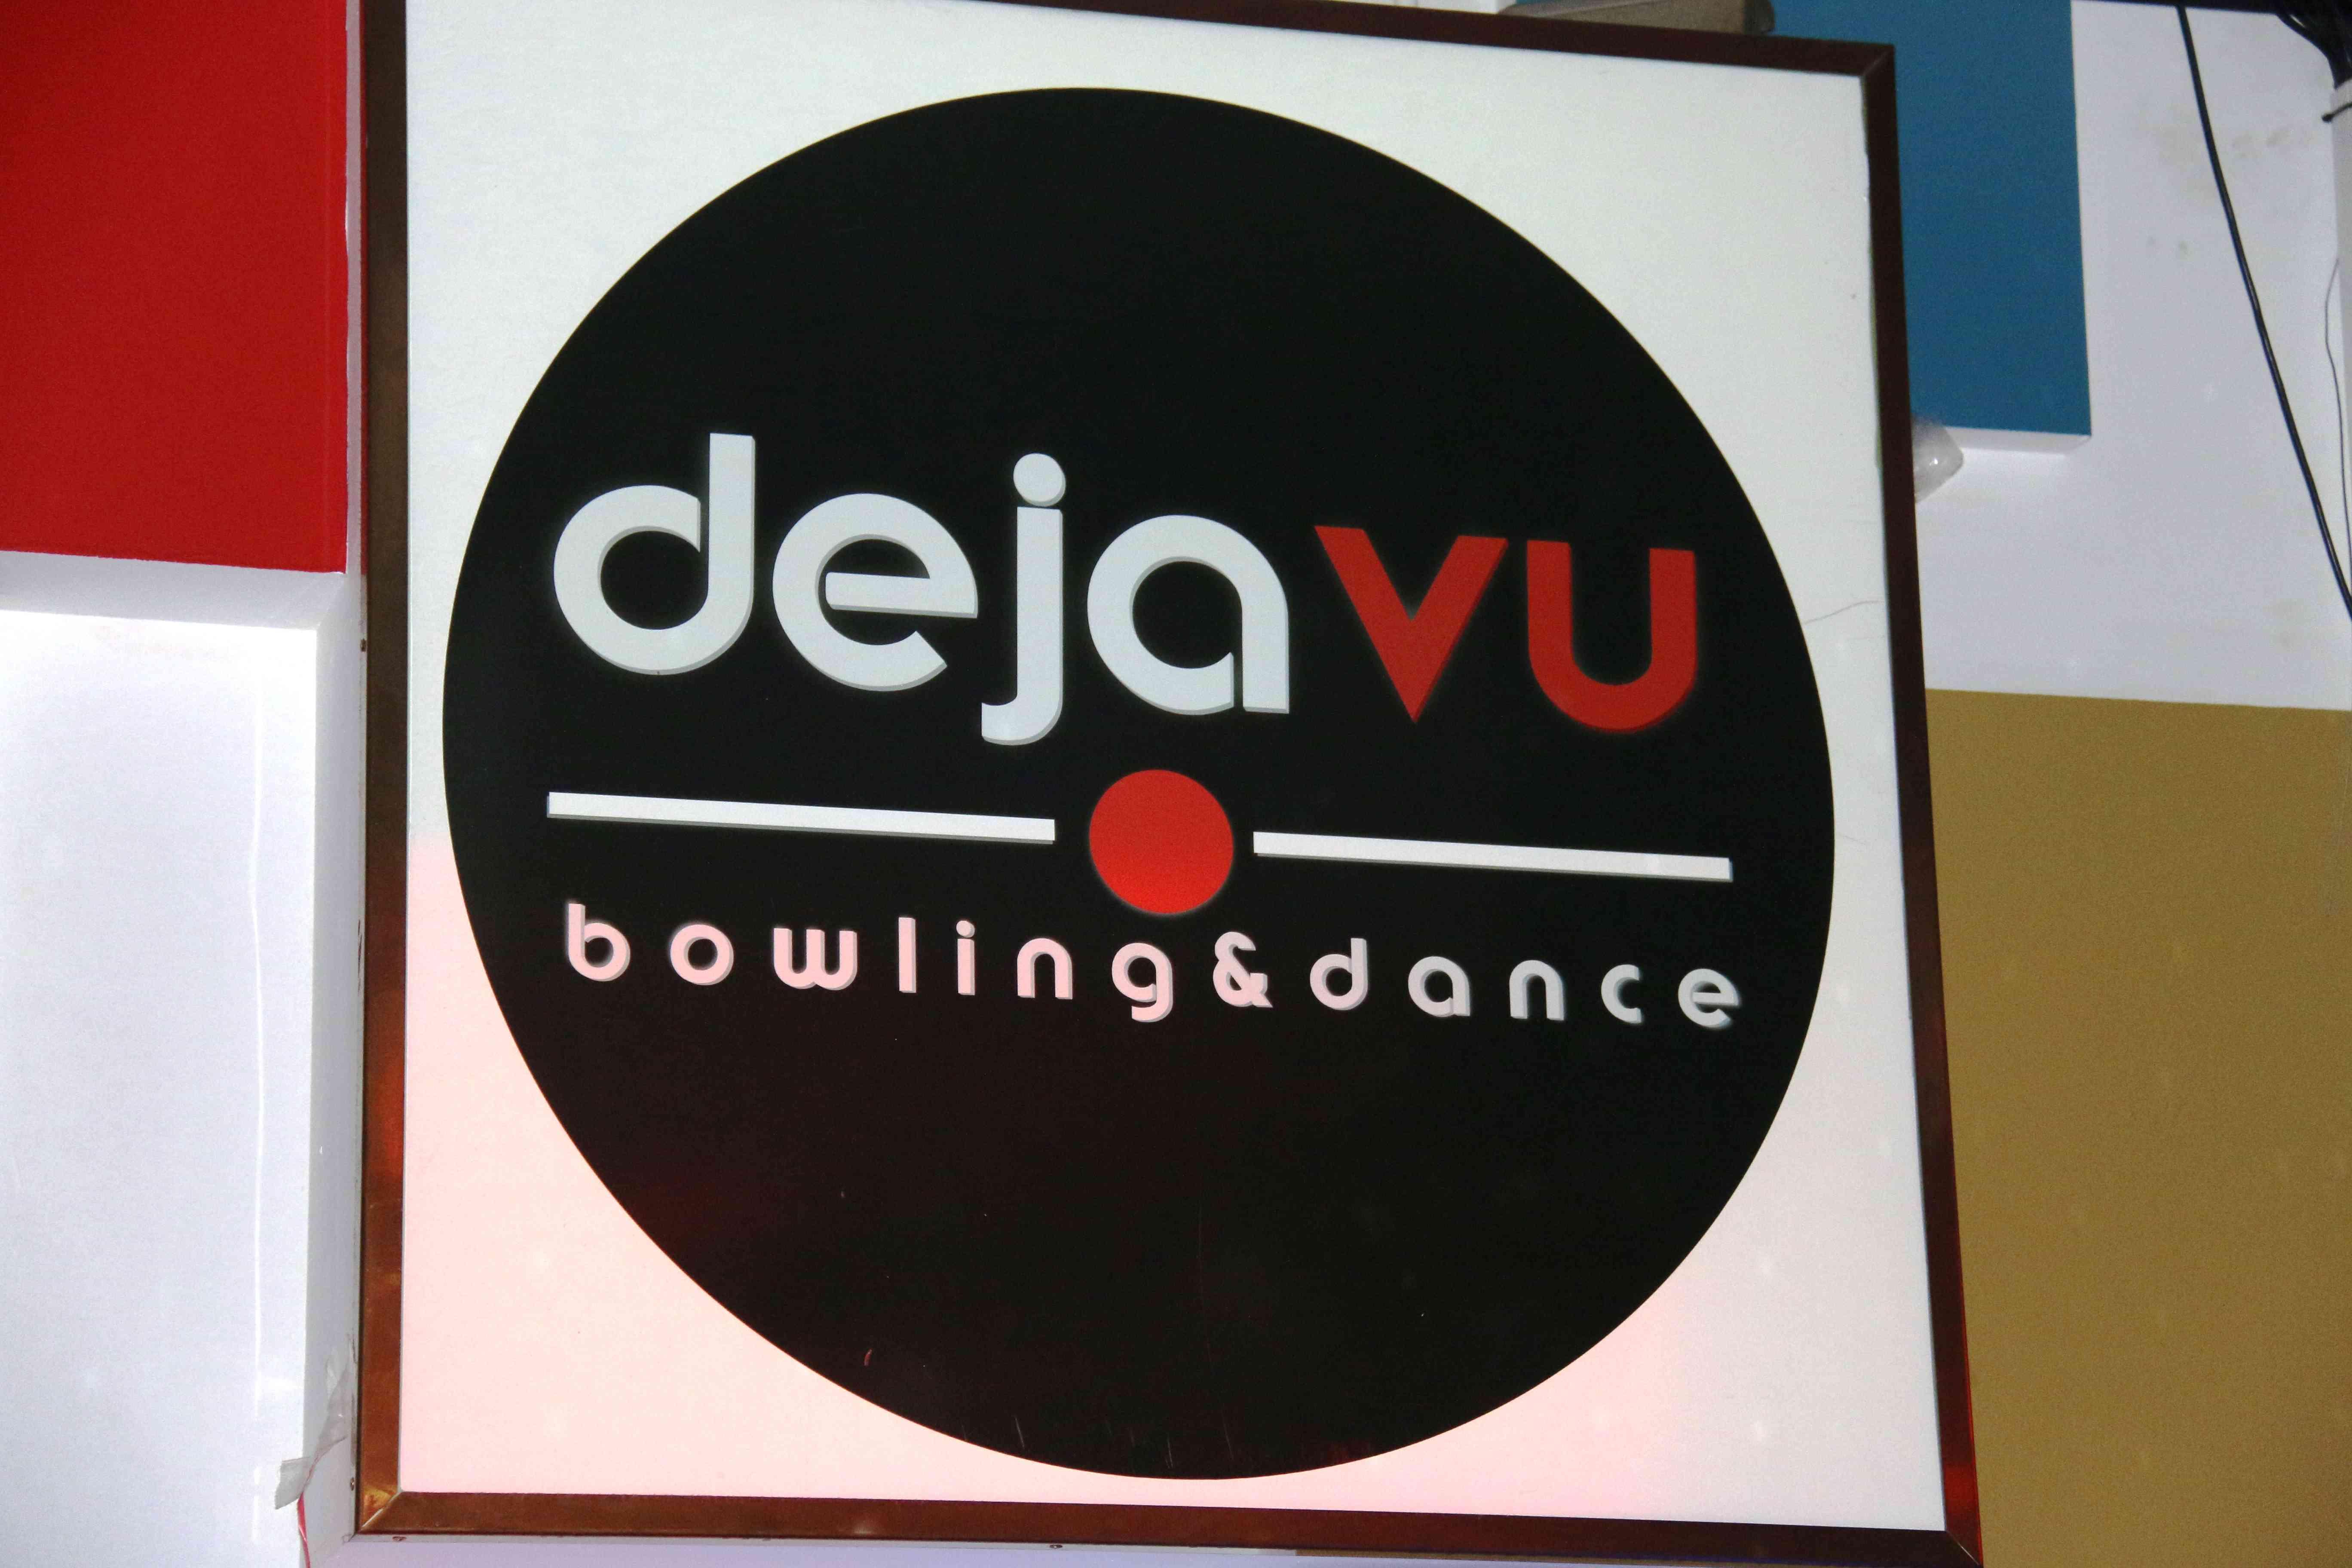 Dejavu Bowling&Dancing